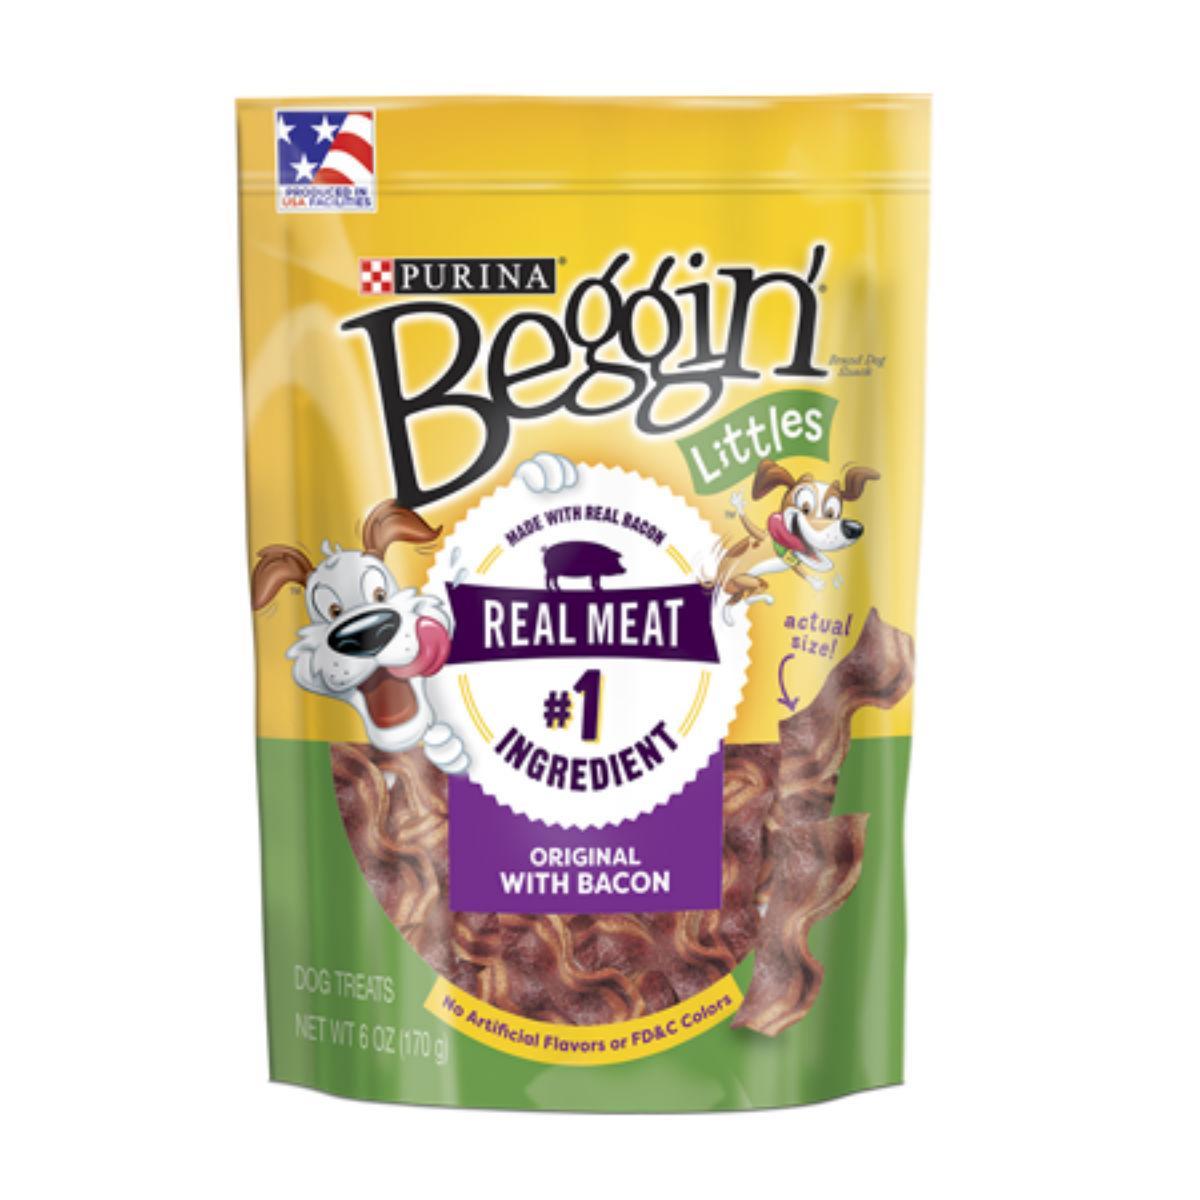 Purina Beggin Littles Dog Treat - Bacon Flavor